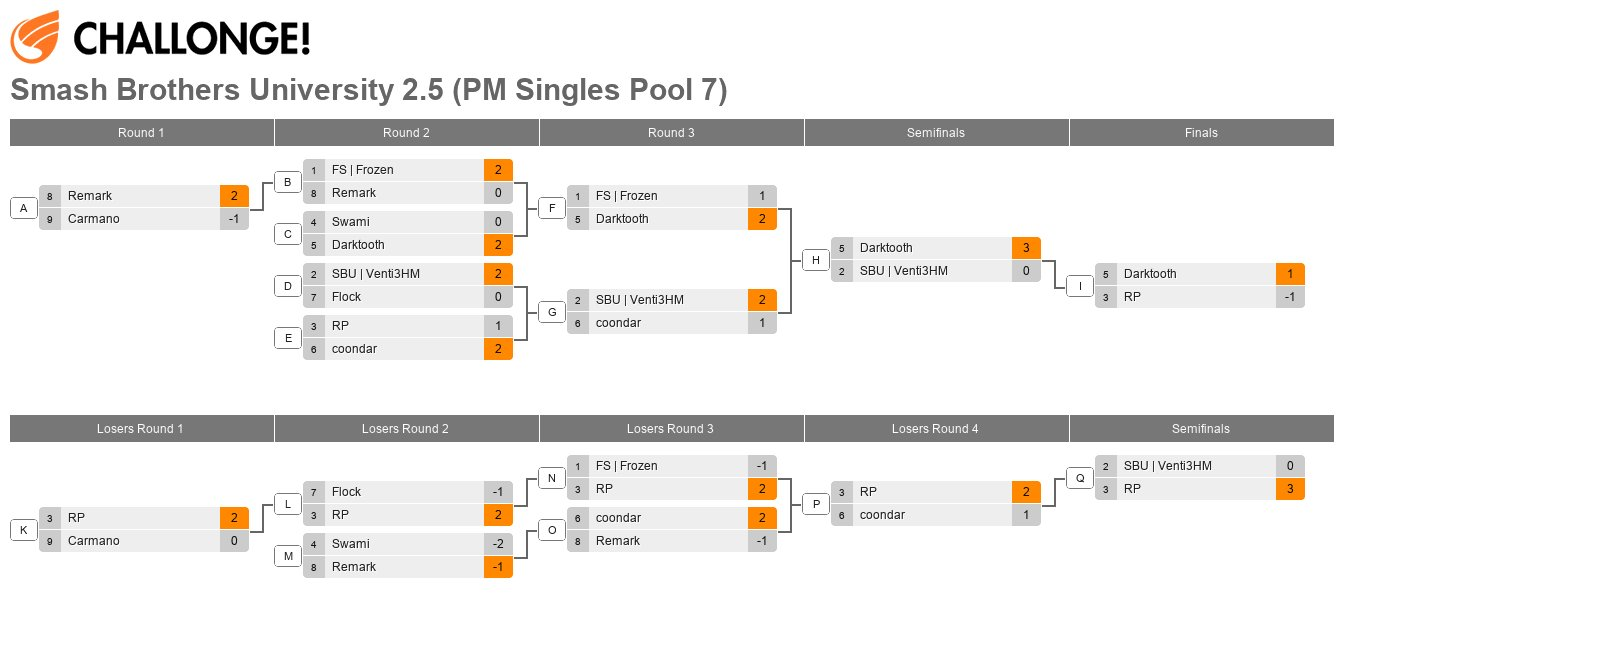 Smash Brothers University 2.5 (PM Singles Pool 7)